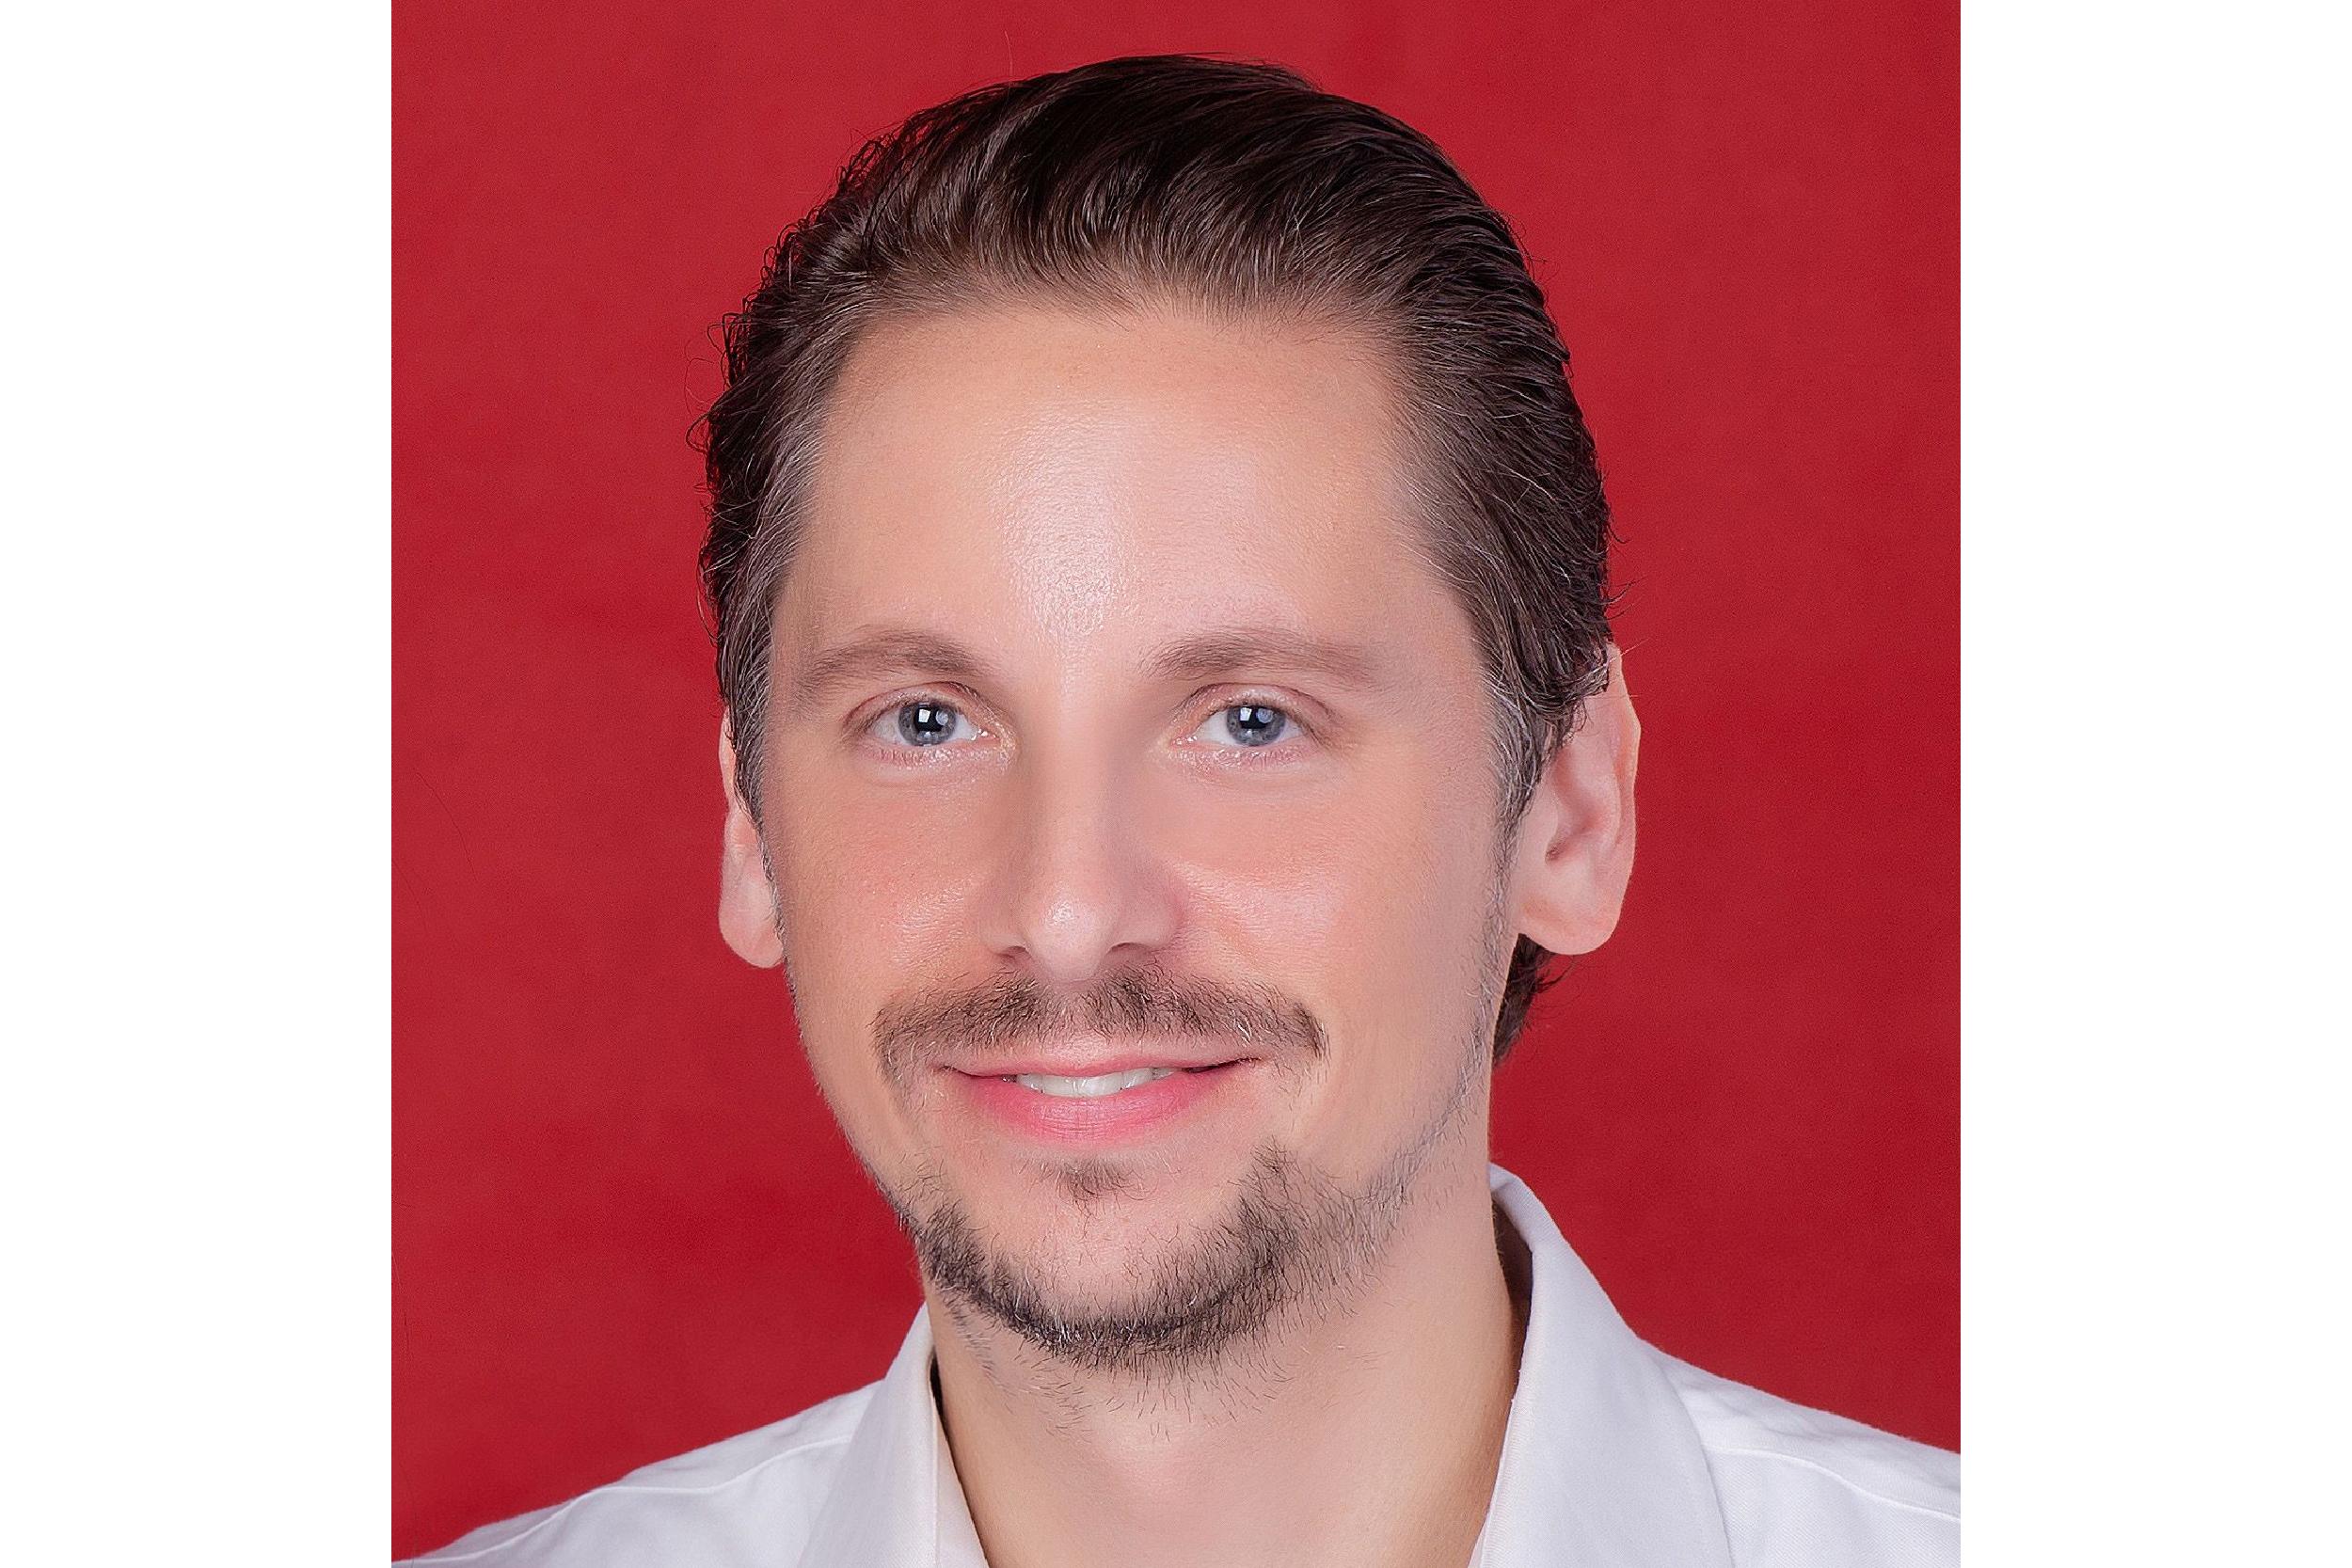 Georg Theiner, PhD